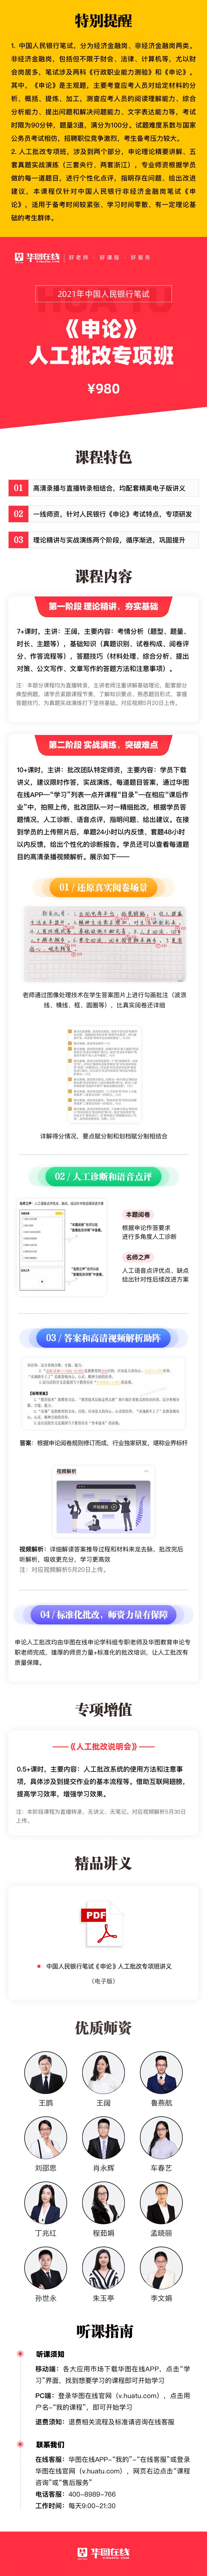 http://upload.htexam.com/userimg/1588243456.png